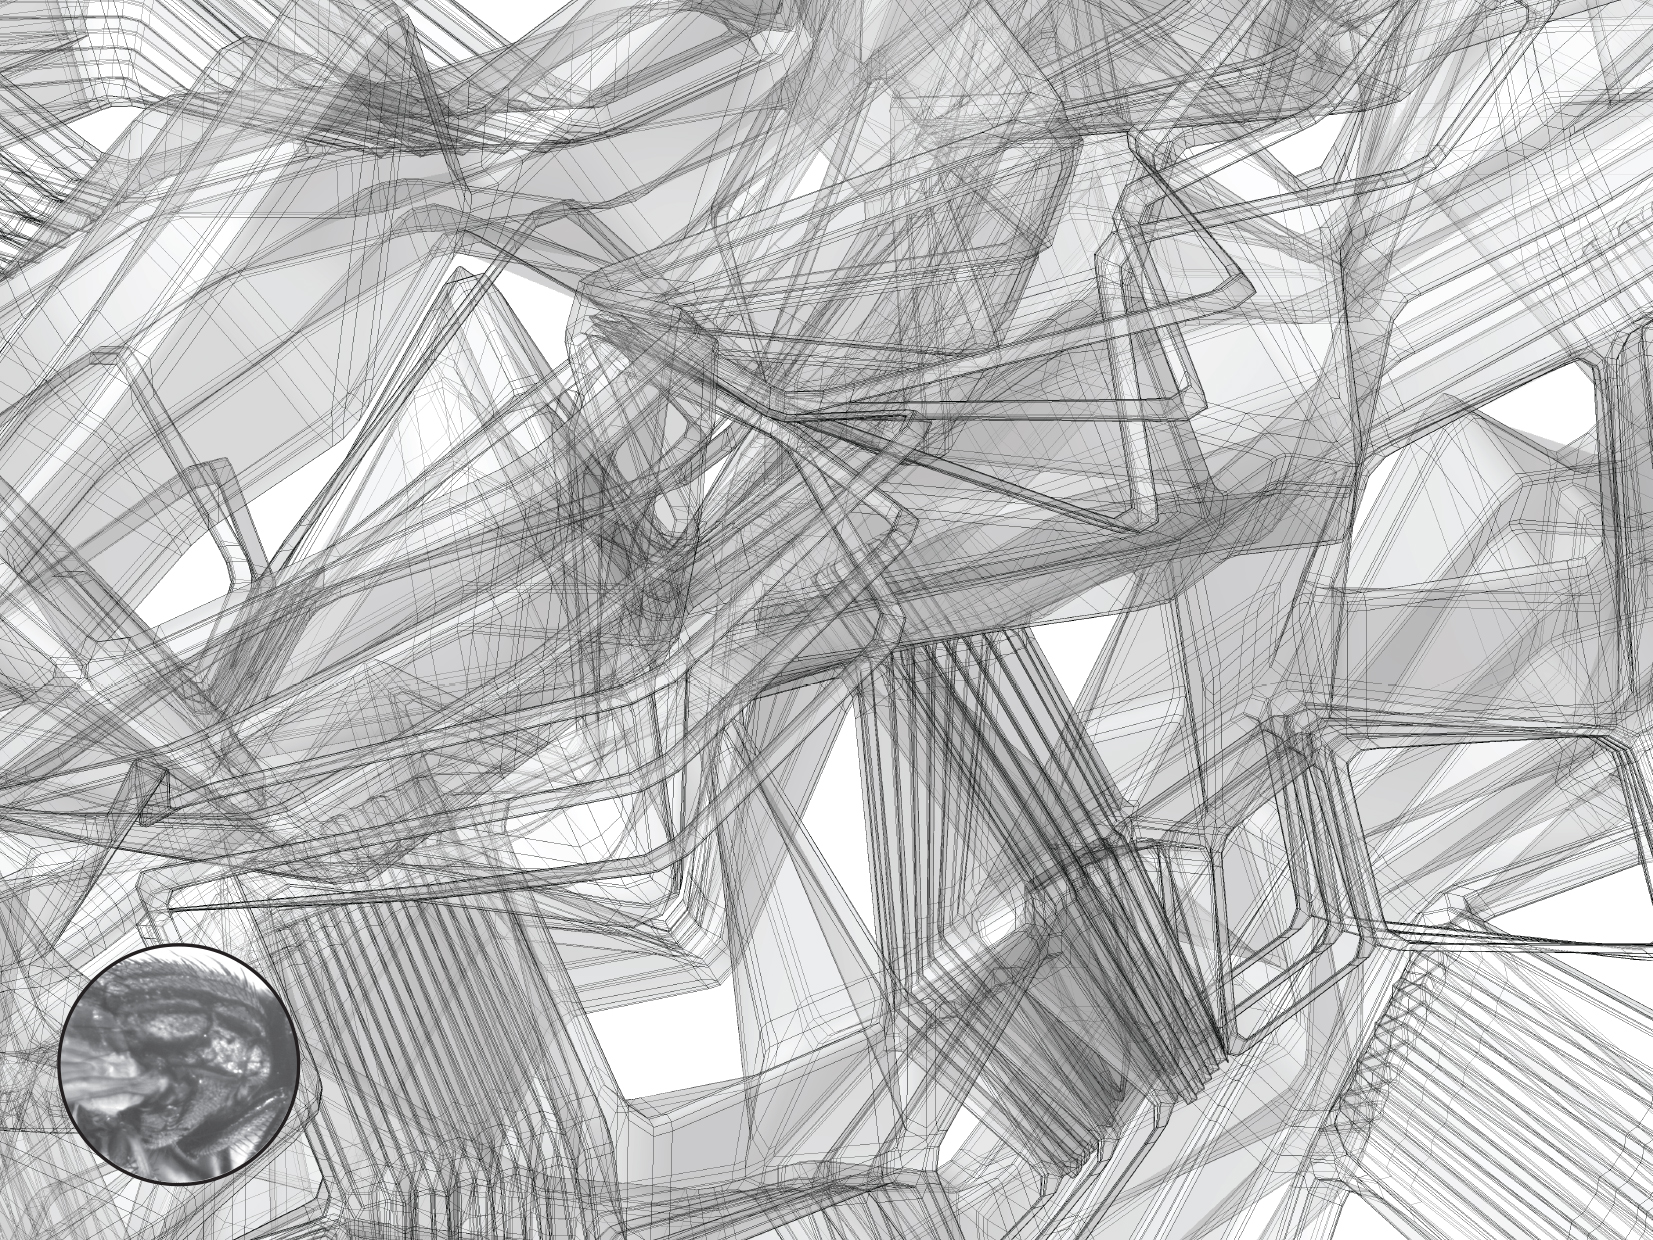 Flori_Kryethi_compiled-21 copy.jpg